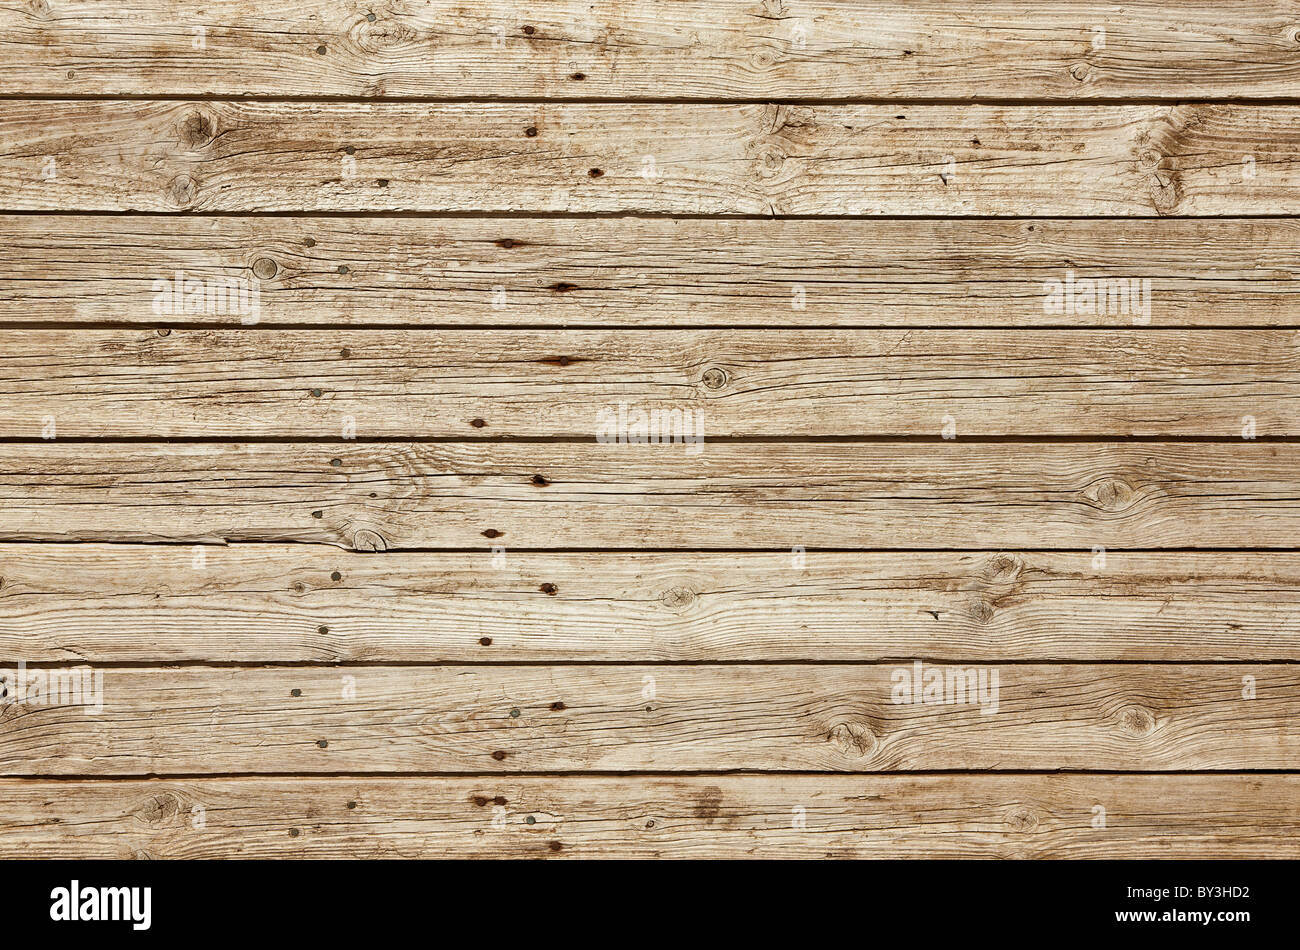 Fondo de madera perfectamente incluso con luz Imagen De Stock